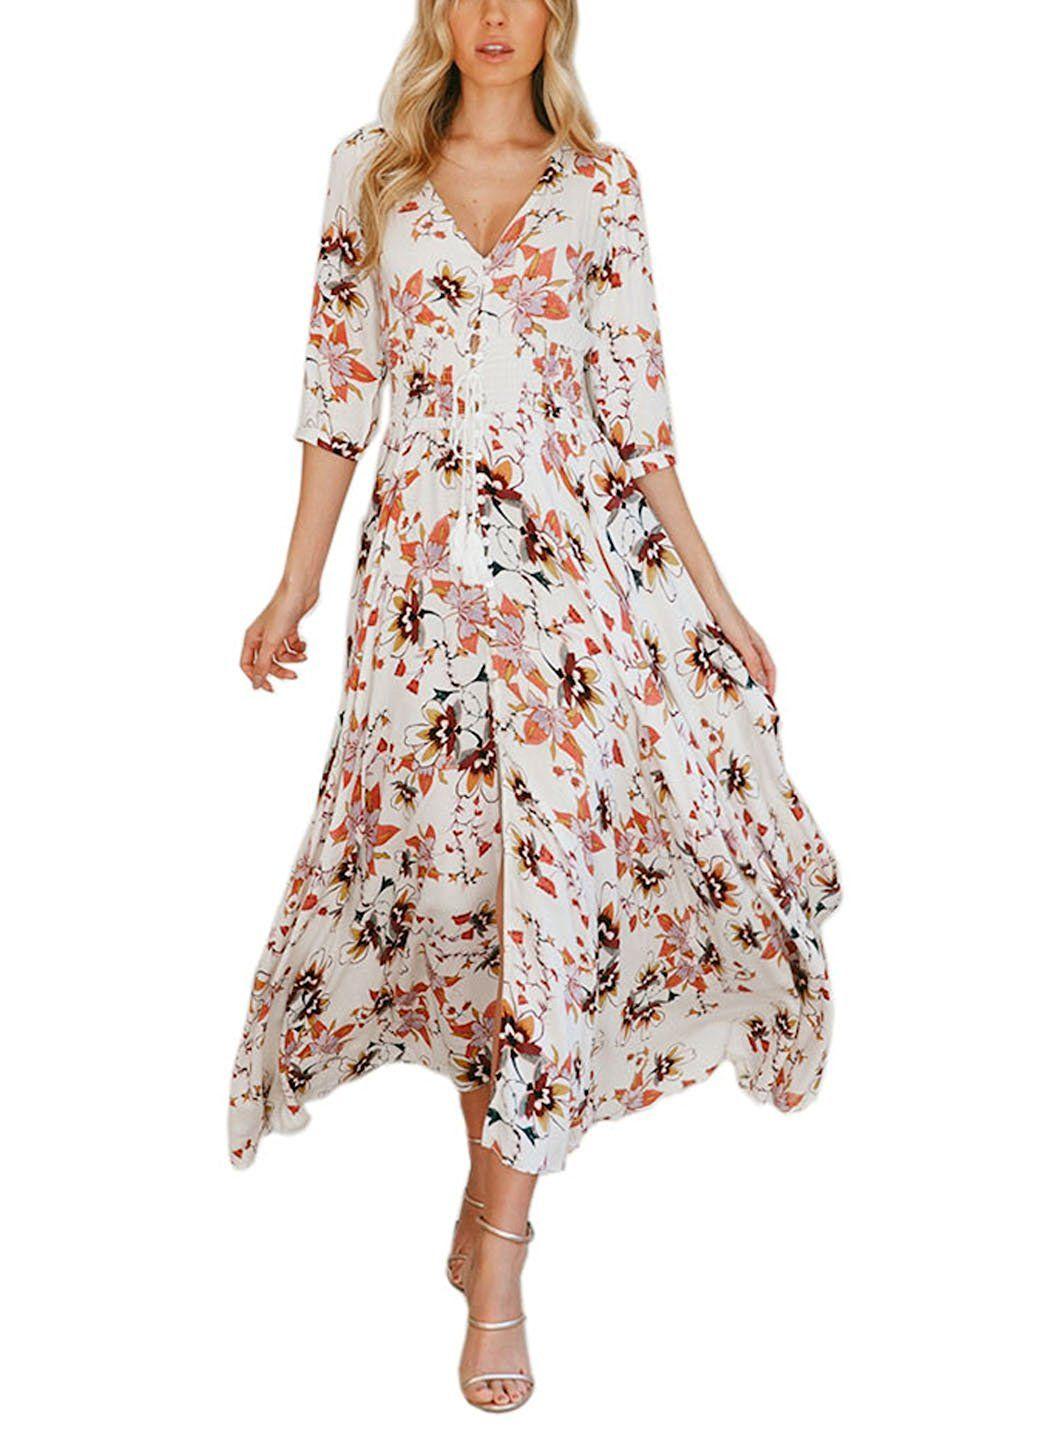 Fflmyuhuliu womenus elegant floral print long sleeve button up party